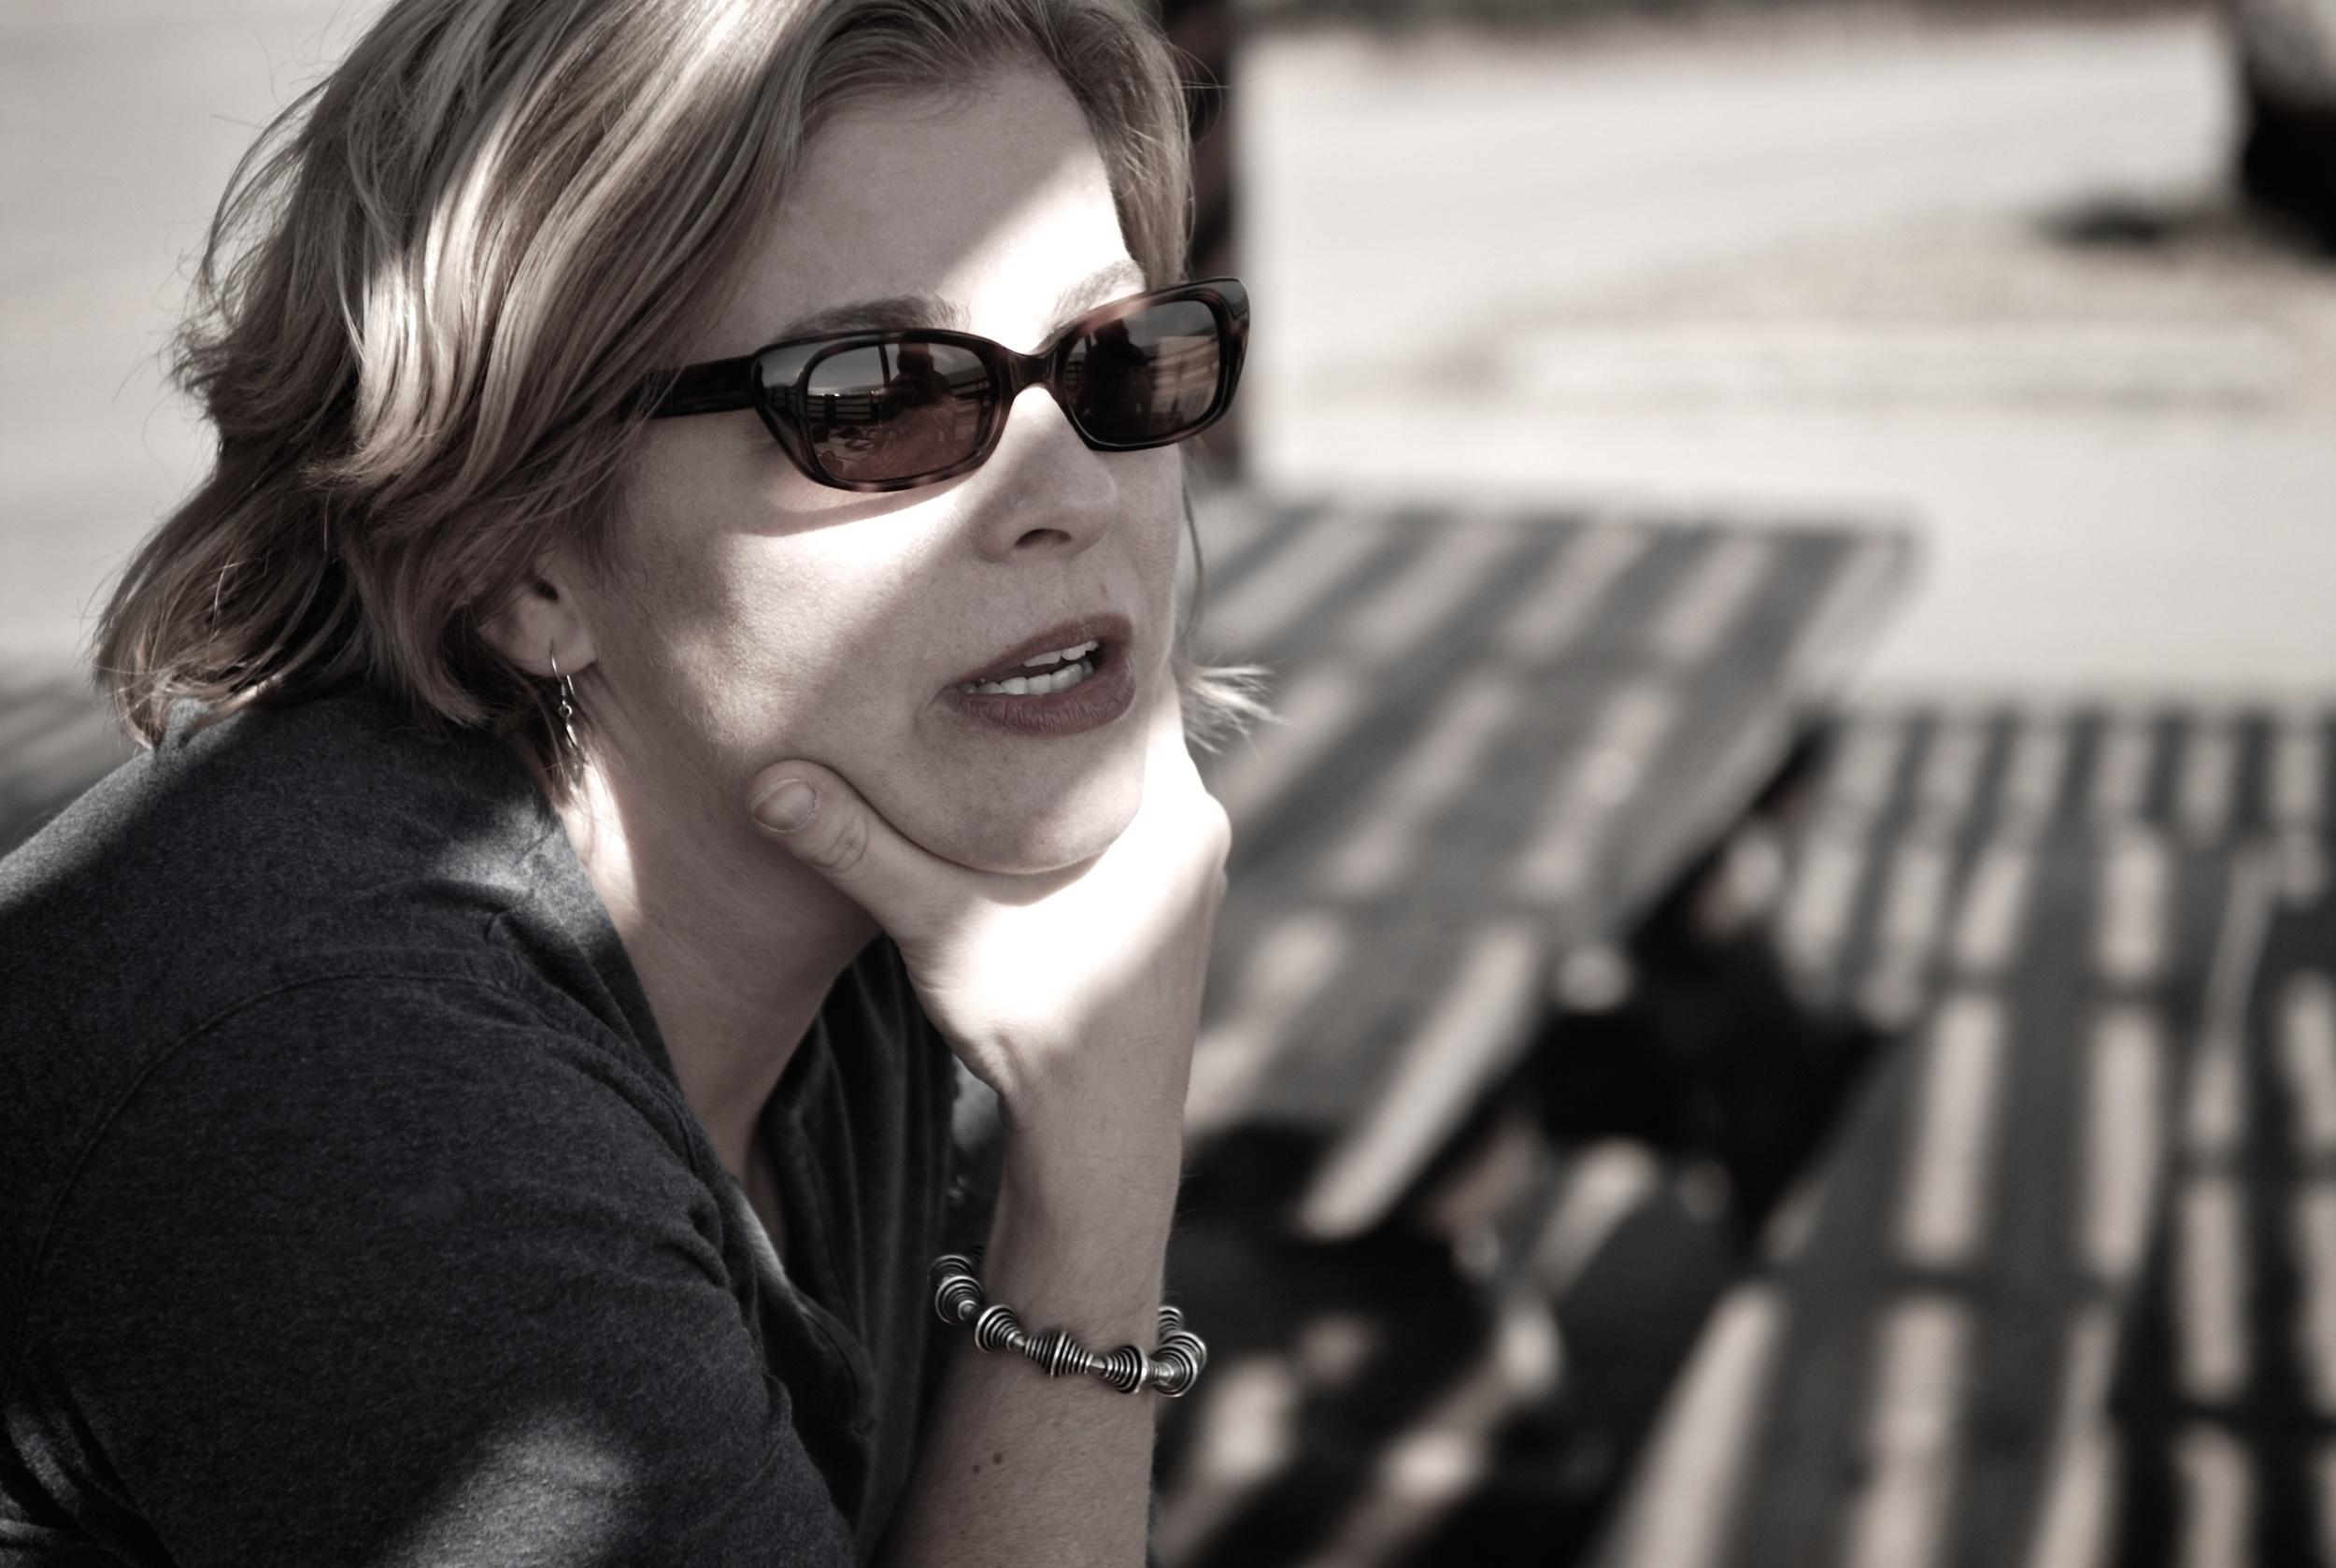 Lady with sunglasses.jpg